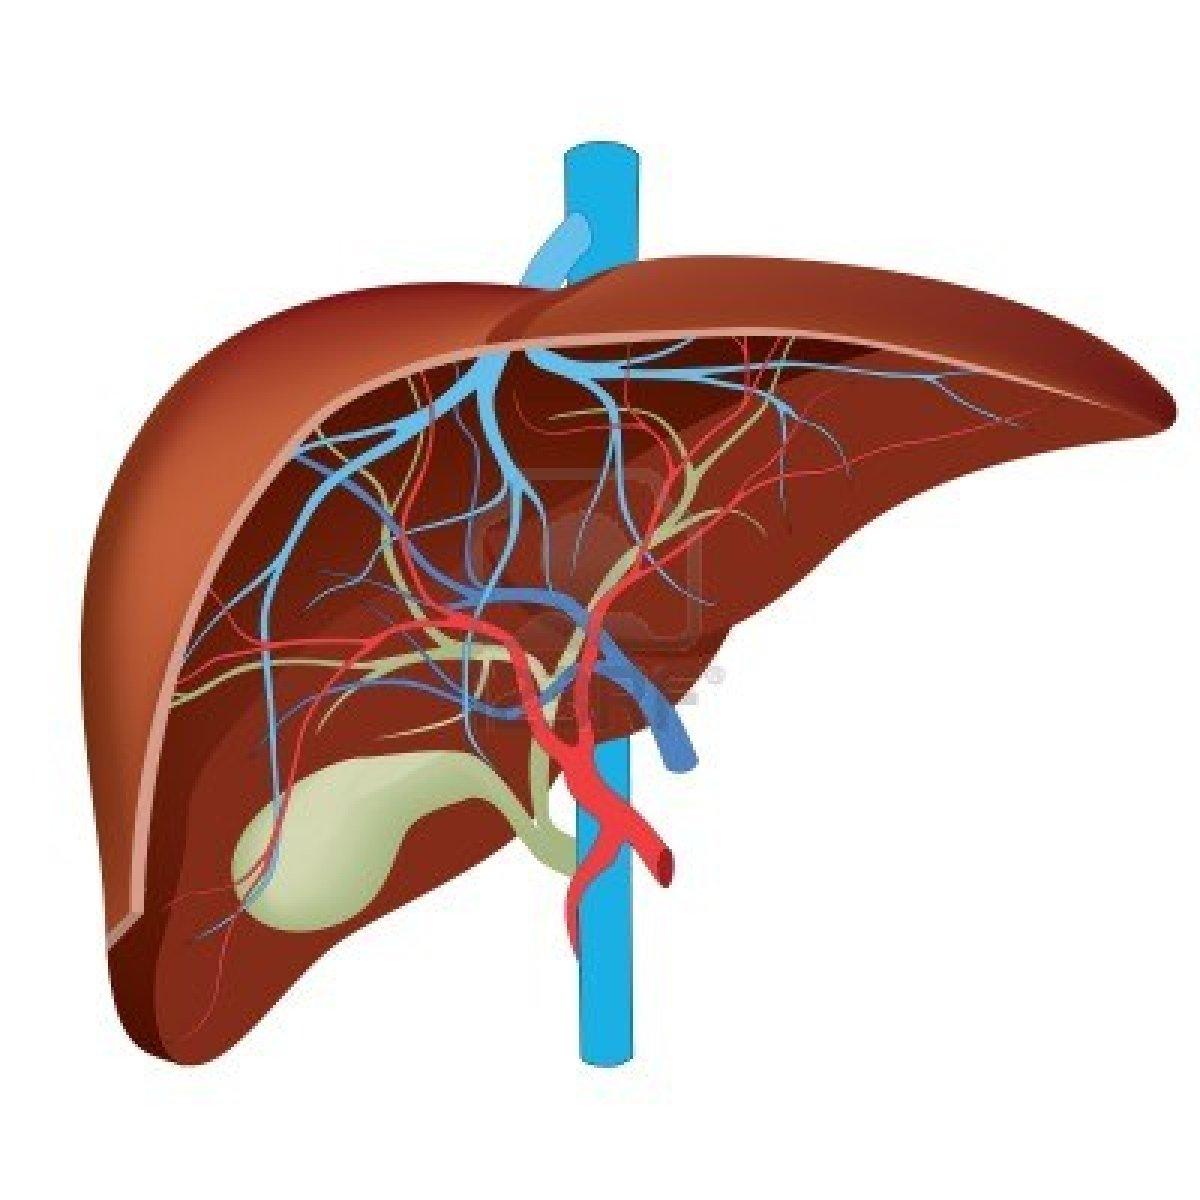 Human Liver Diagram Drawing Free Image